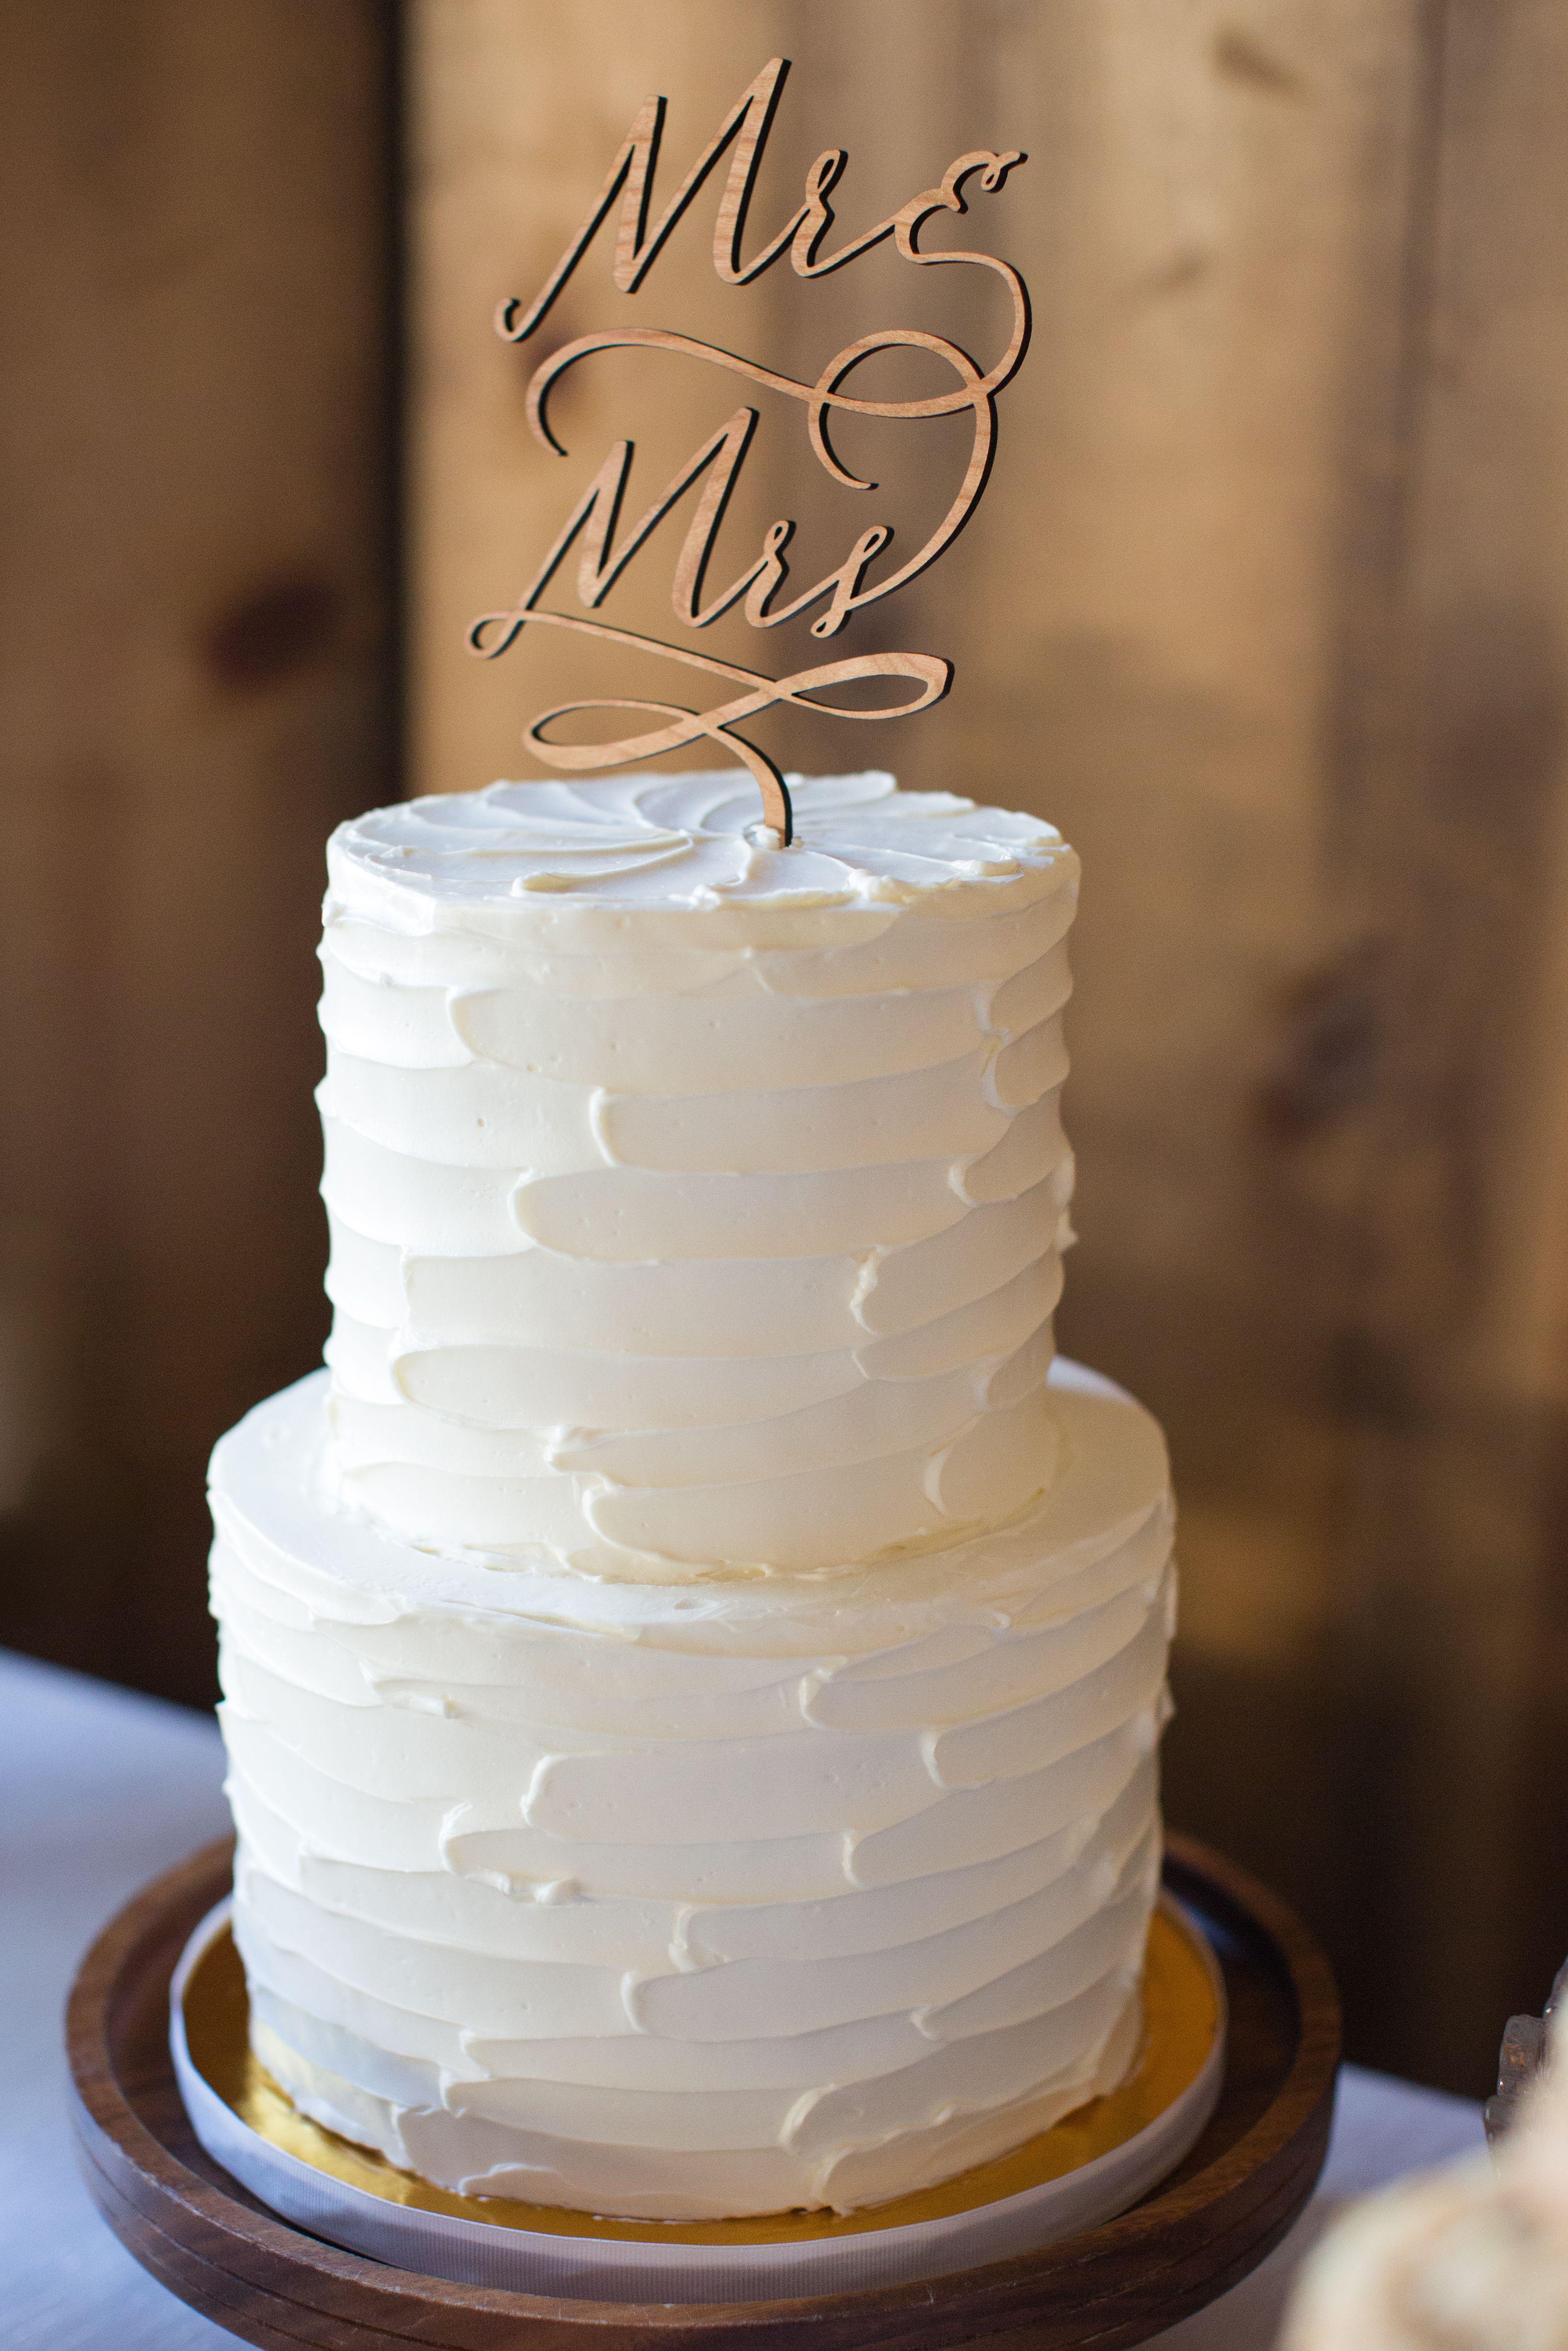 simplicity takes the cake white wedding cakes wedding cake and cake white wedding cake with wooden topper